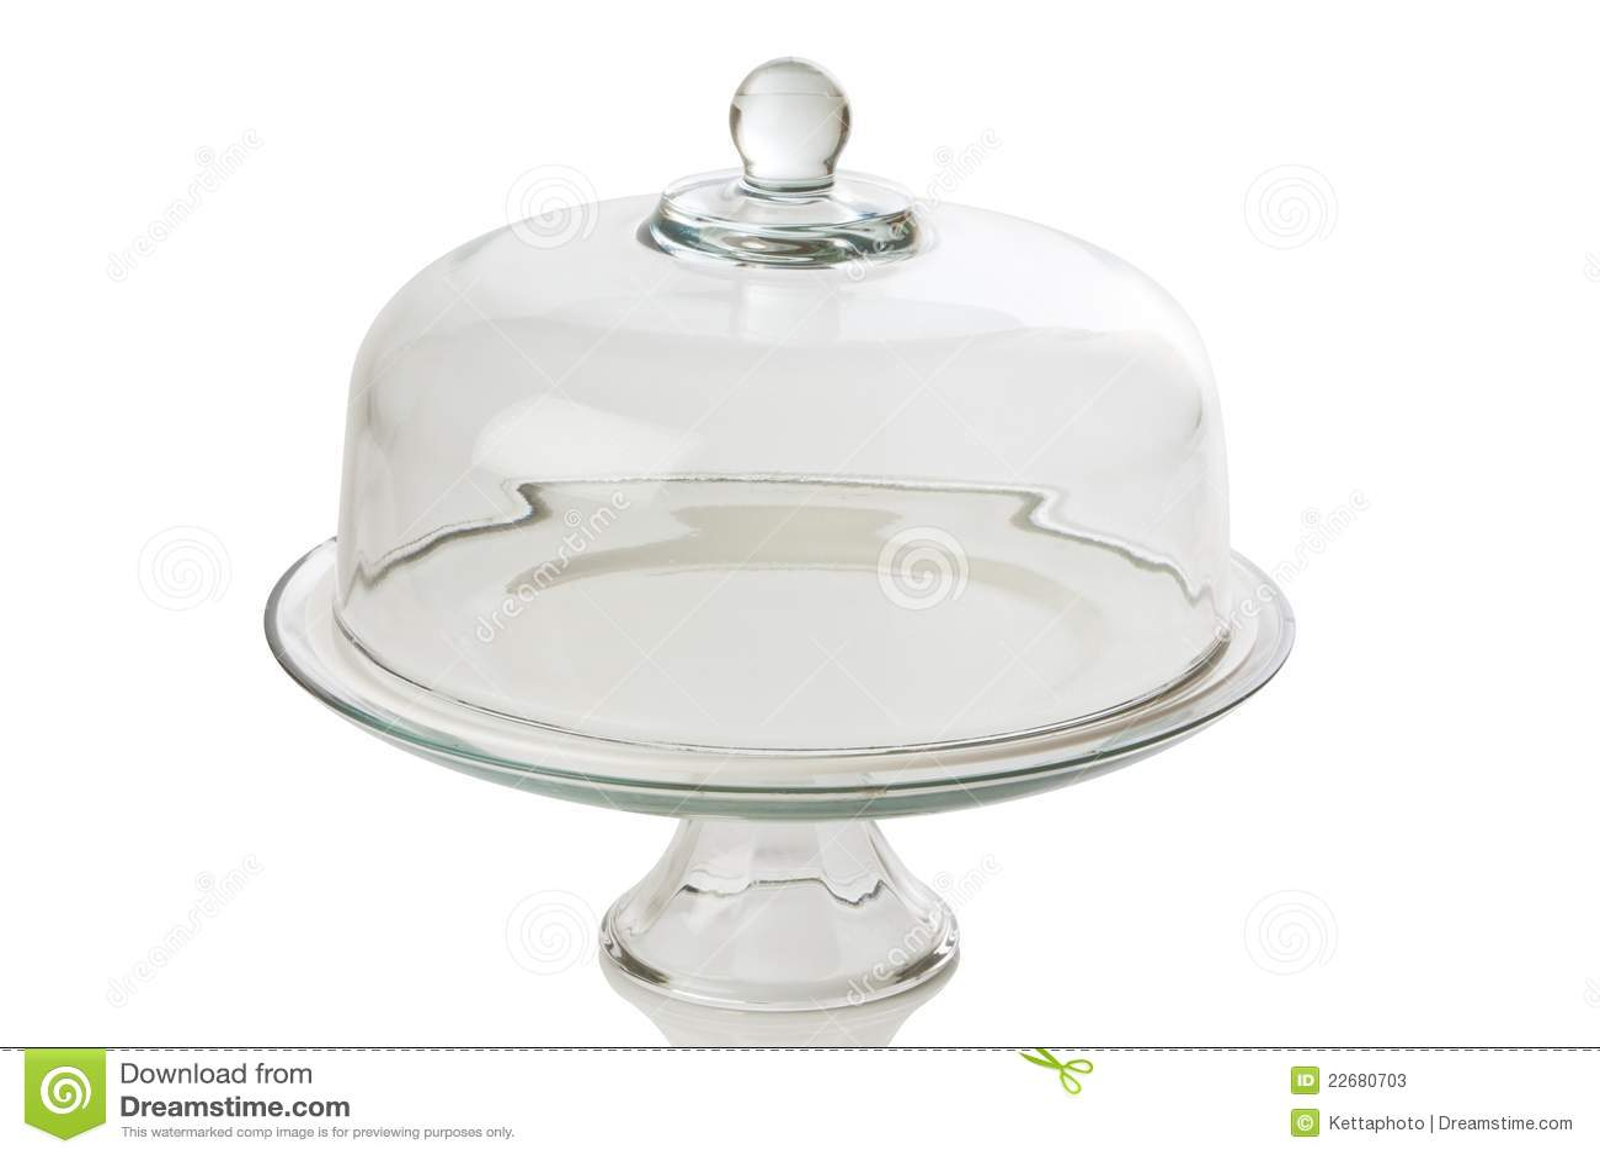 Glass Cake Tray Stock Photos Image 22680703